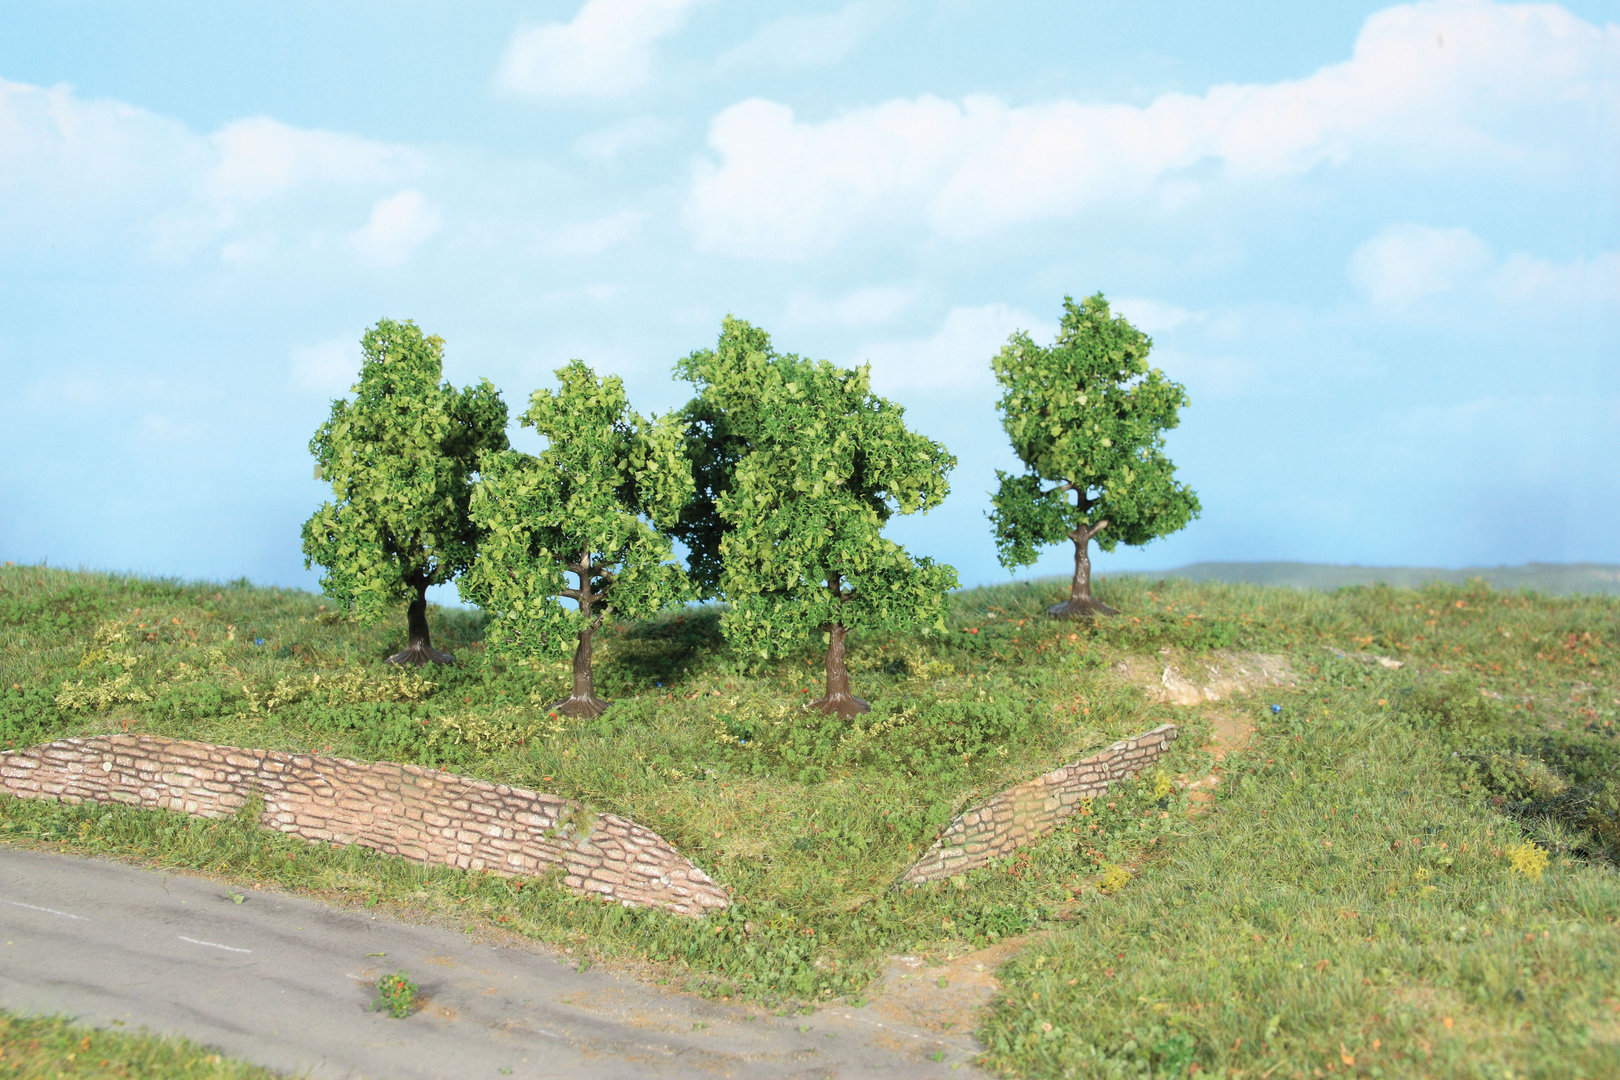 Végétation miniature : Arbres fruitiers 7 cm - Heki 19111